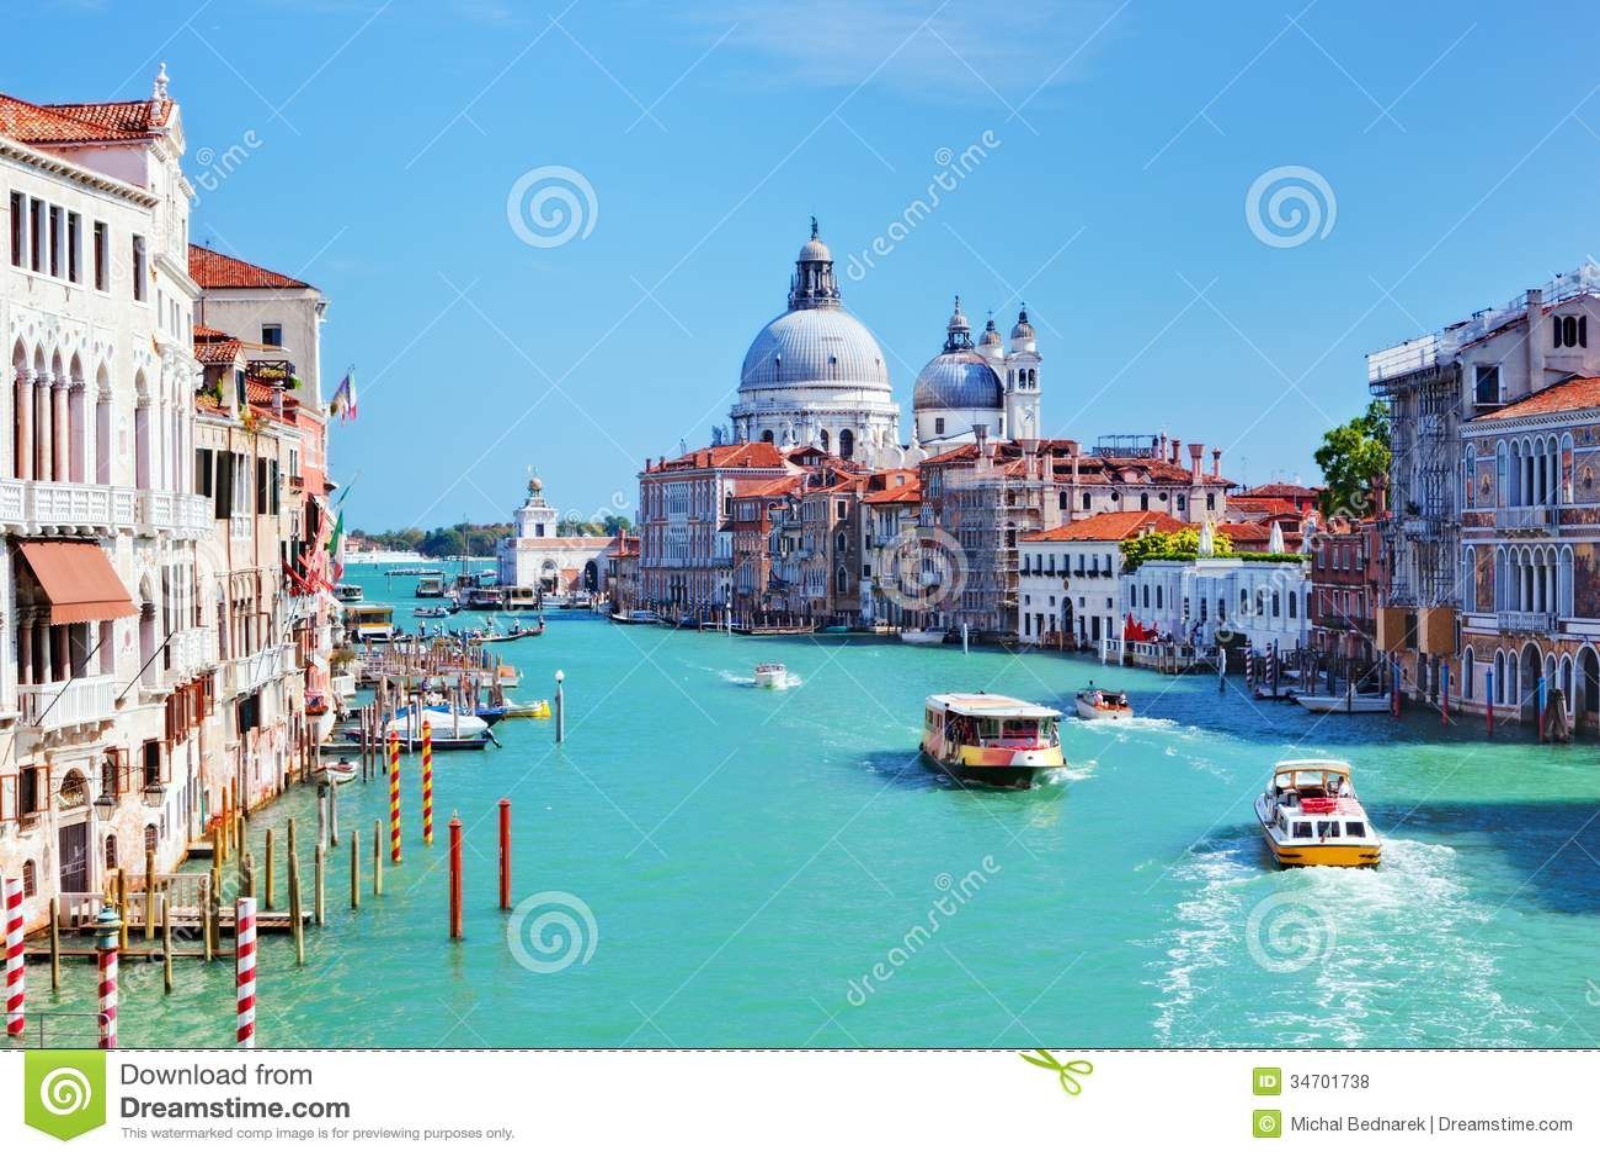 Venedig, Italien. Grand Canal und Basilika Santa Maria della Salute